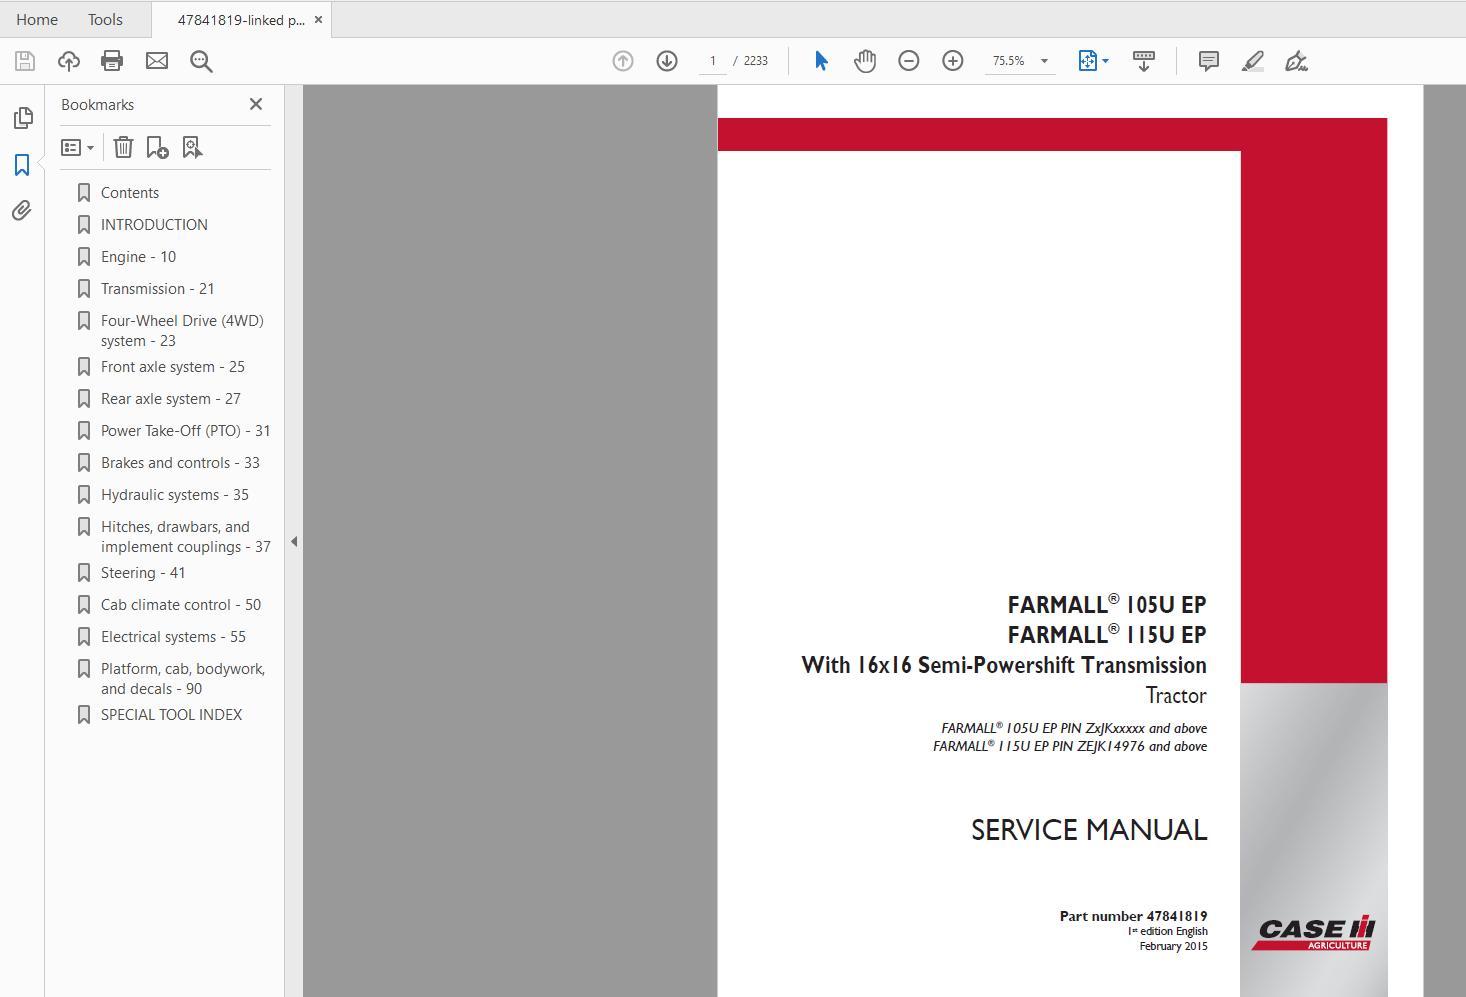 Case_IH_Agricultural_2019_Full_Service_Manual_150Gb9